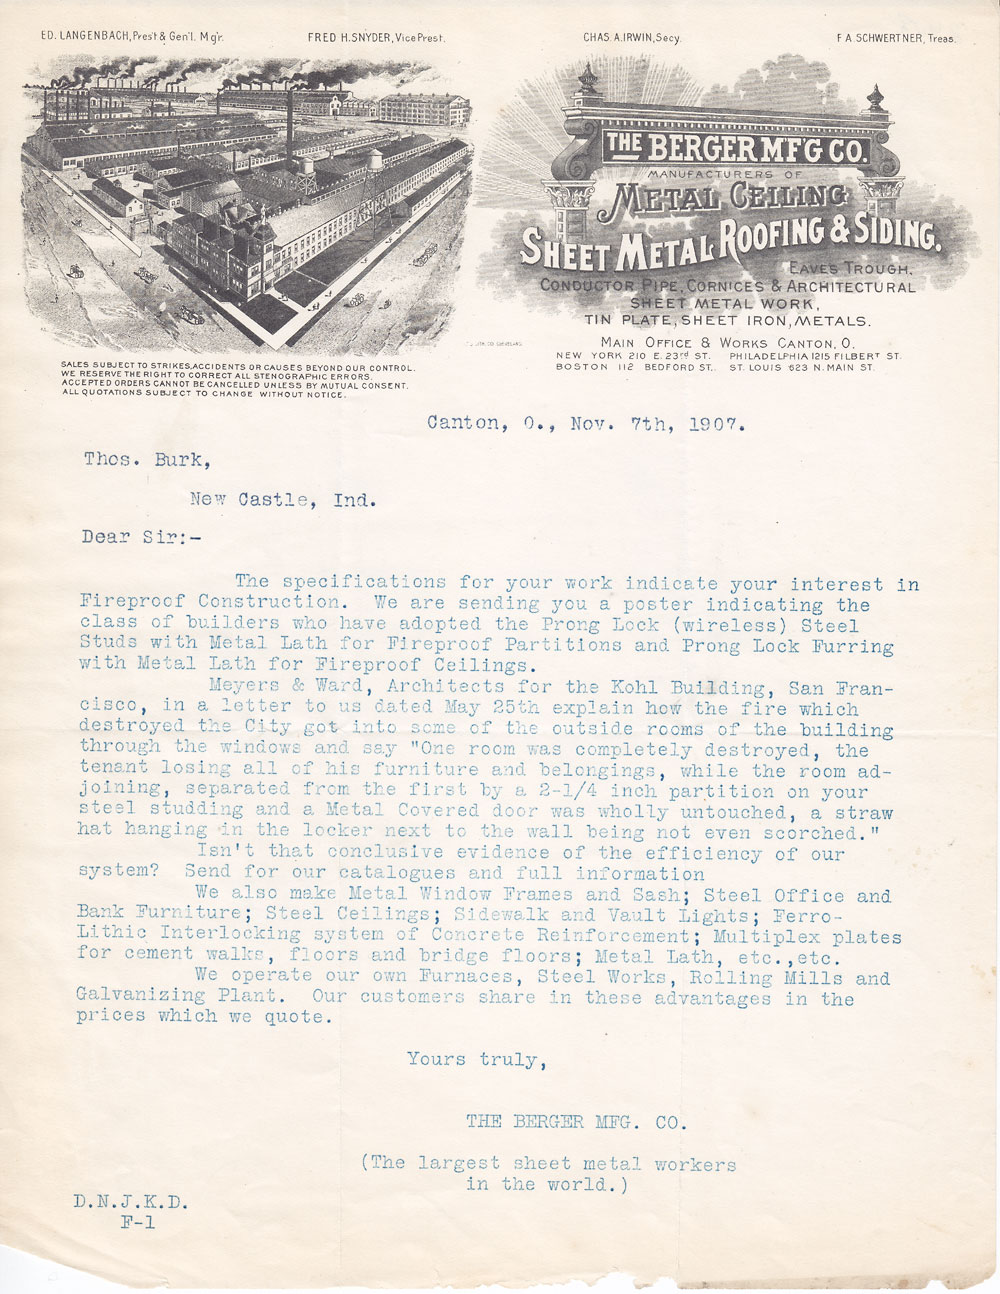 letterhead the berger mfg co canton ohio